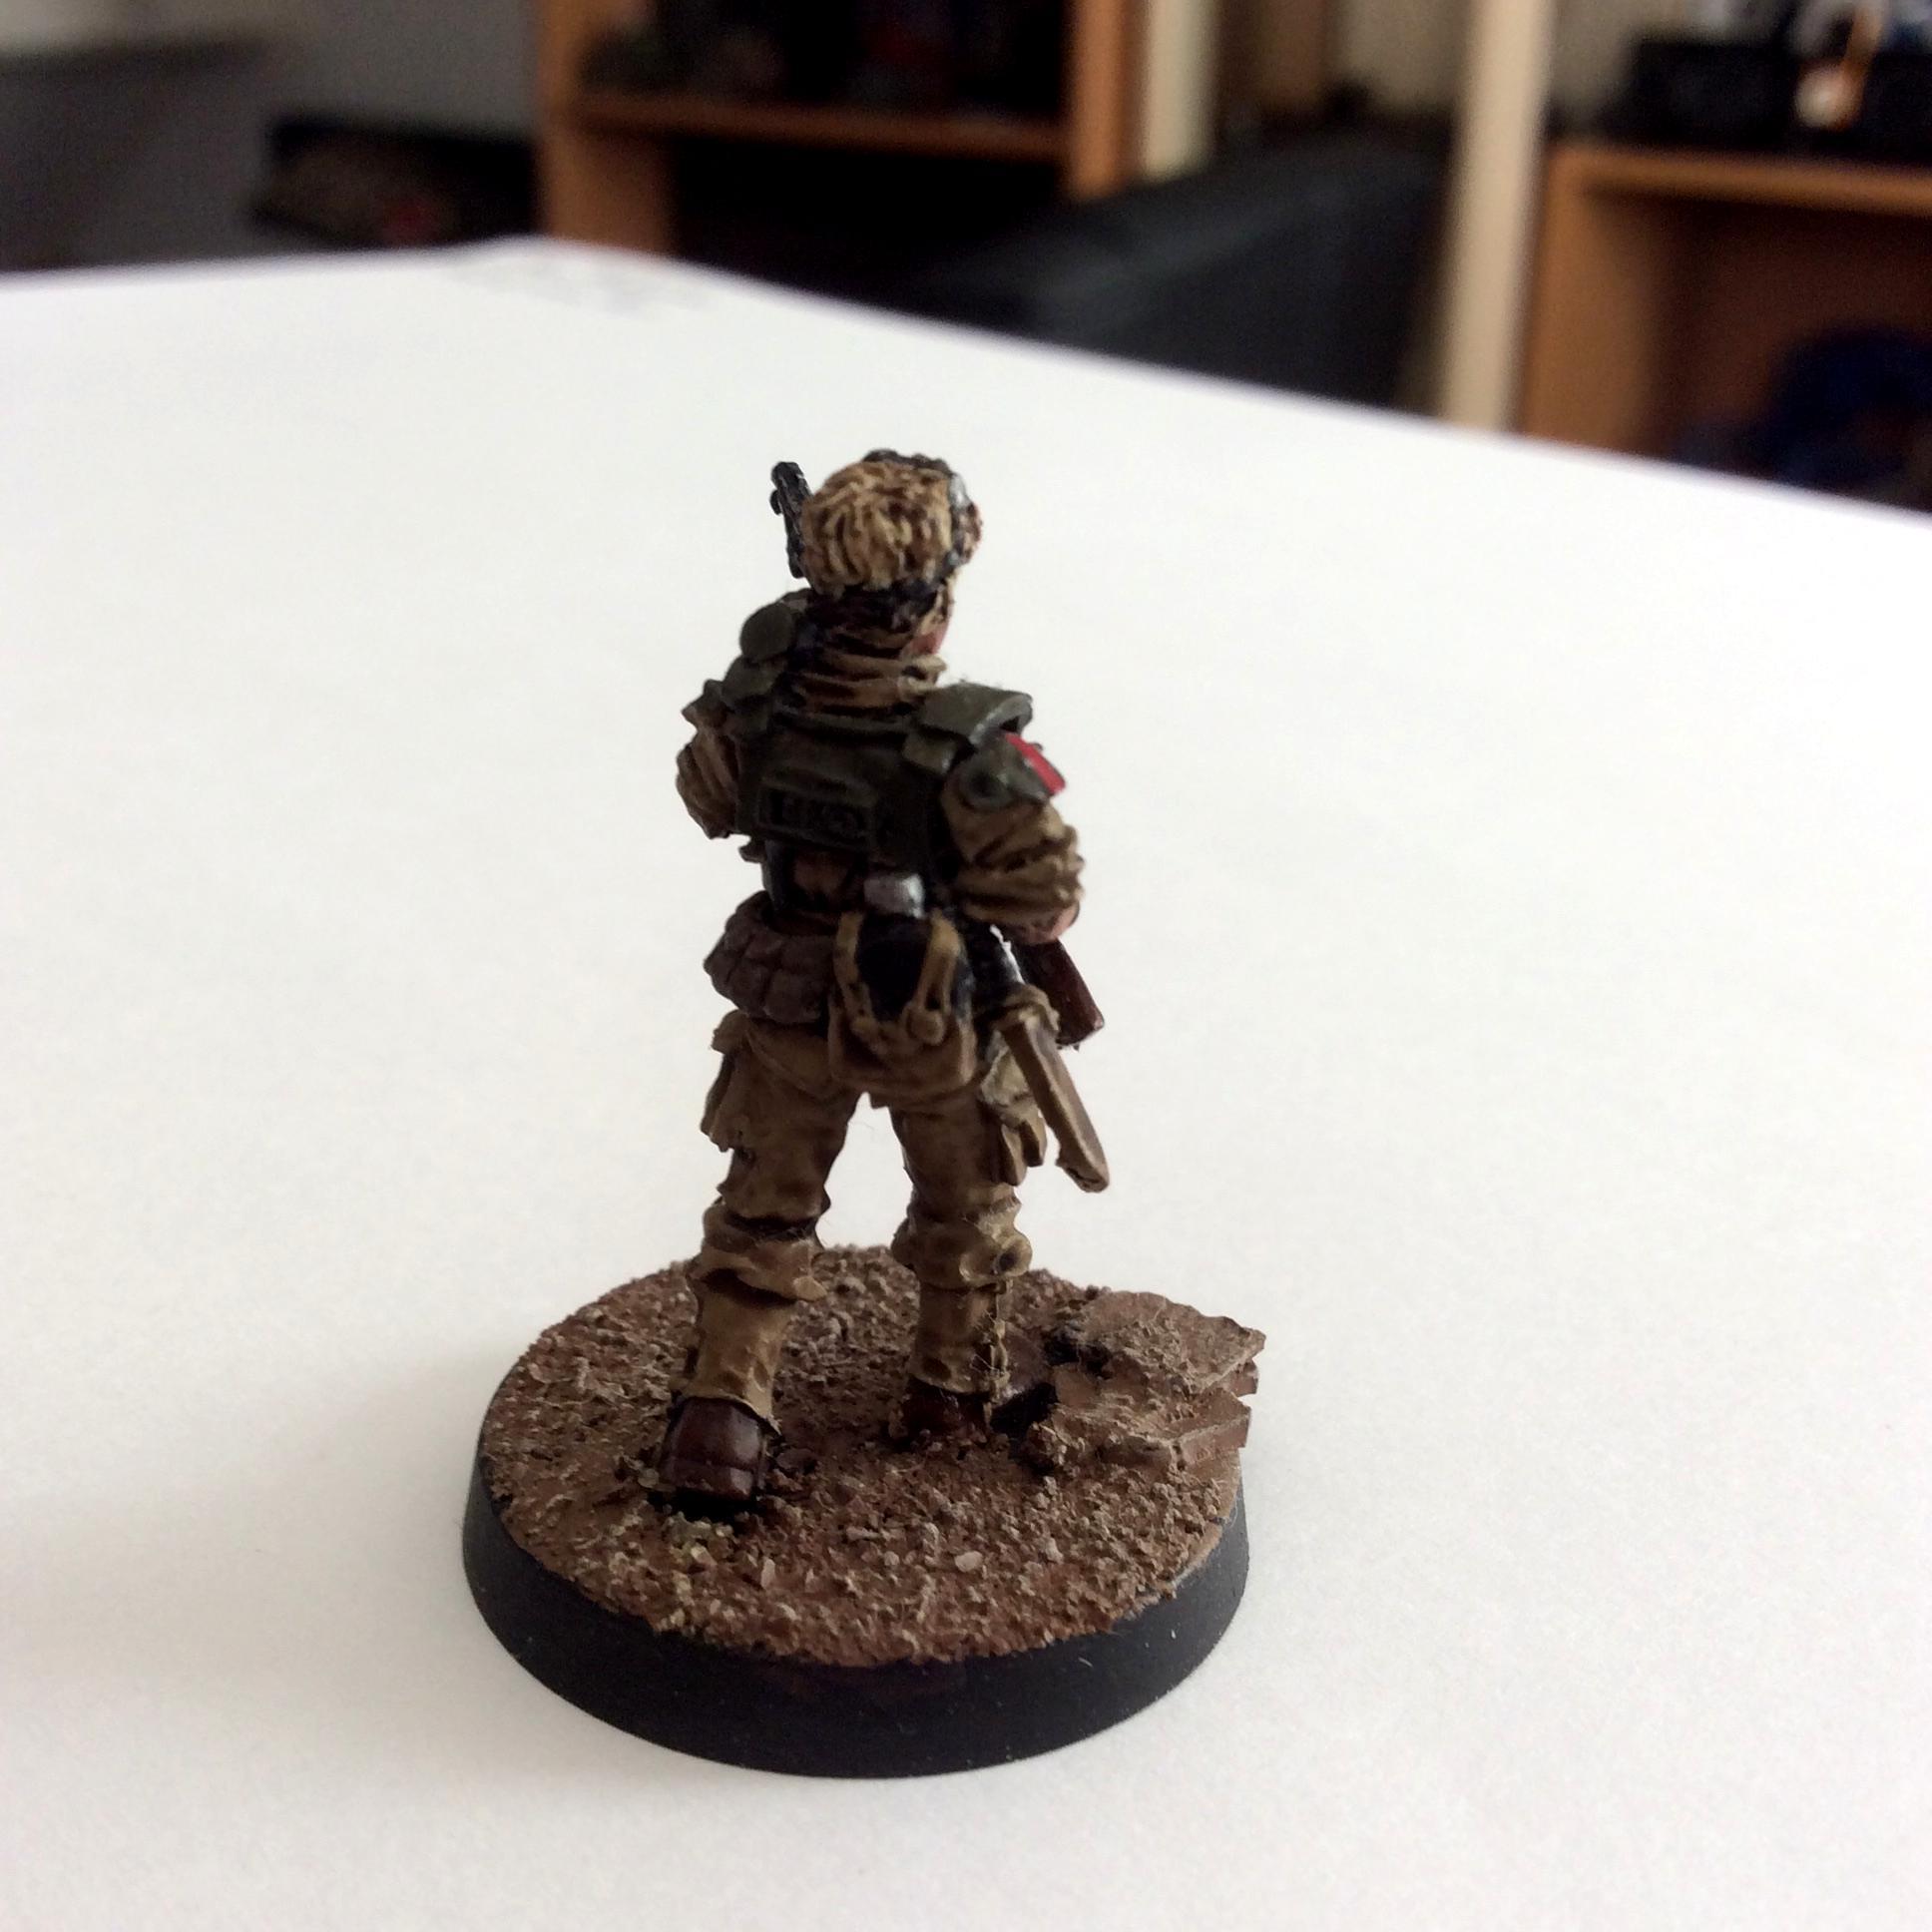 Astra Militarum, Female, Female Guard, Grrrl, Halloween, Imperial Guard, Shotgun, Warhammer 40,000, Woman